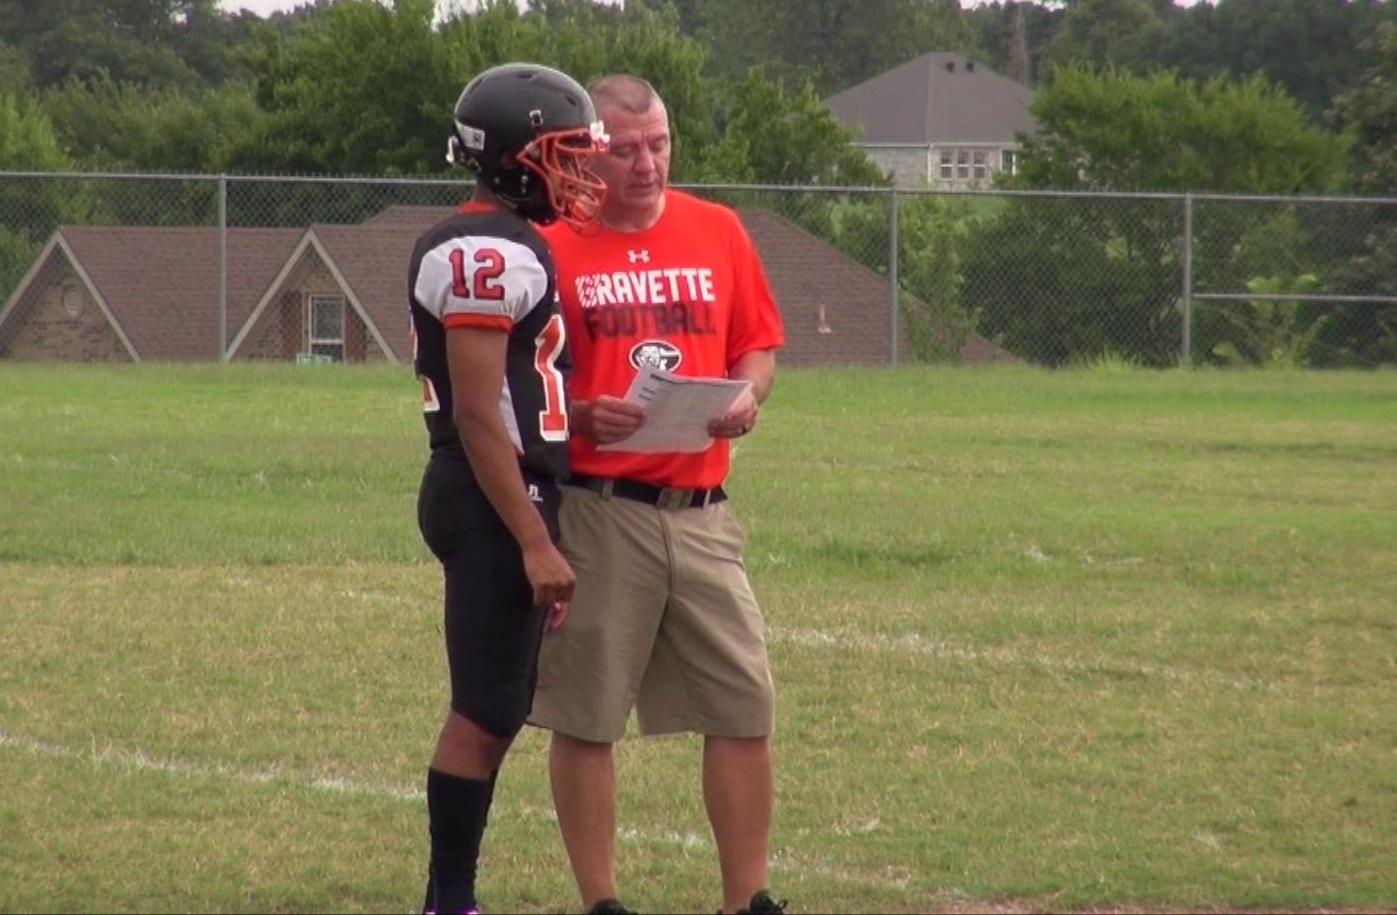 Gravette Football Coach Doug Greenwood Resigns